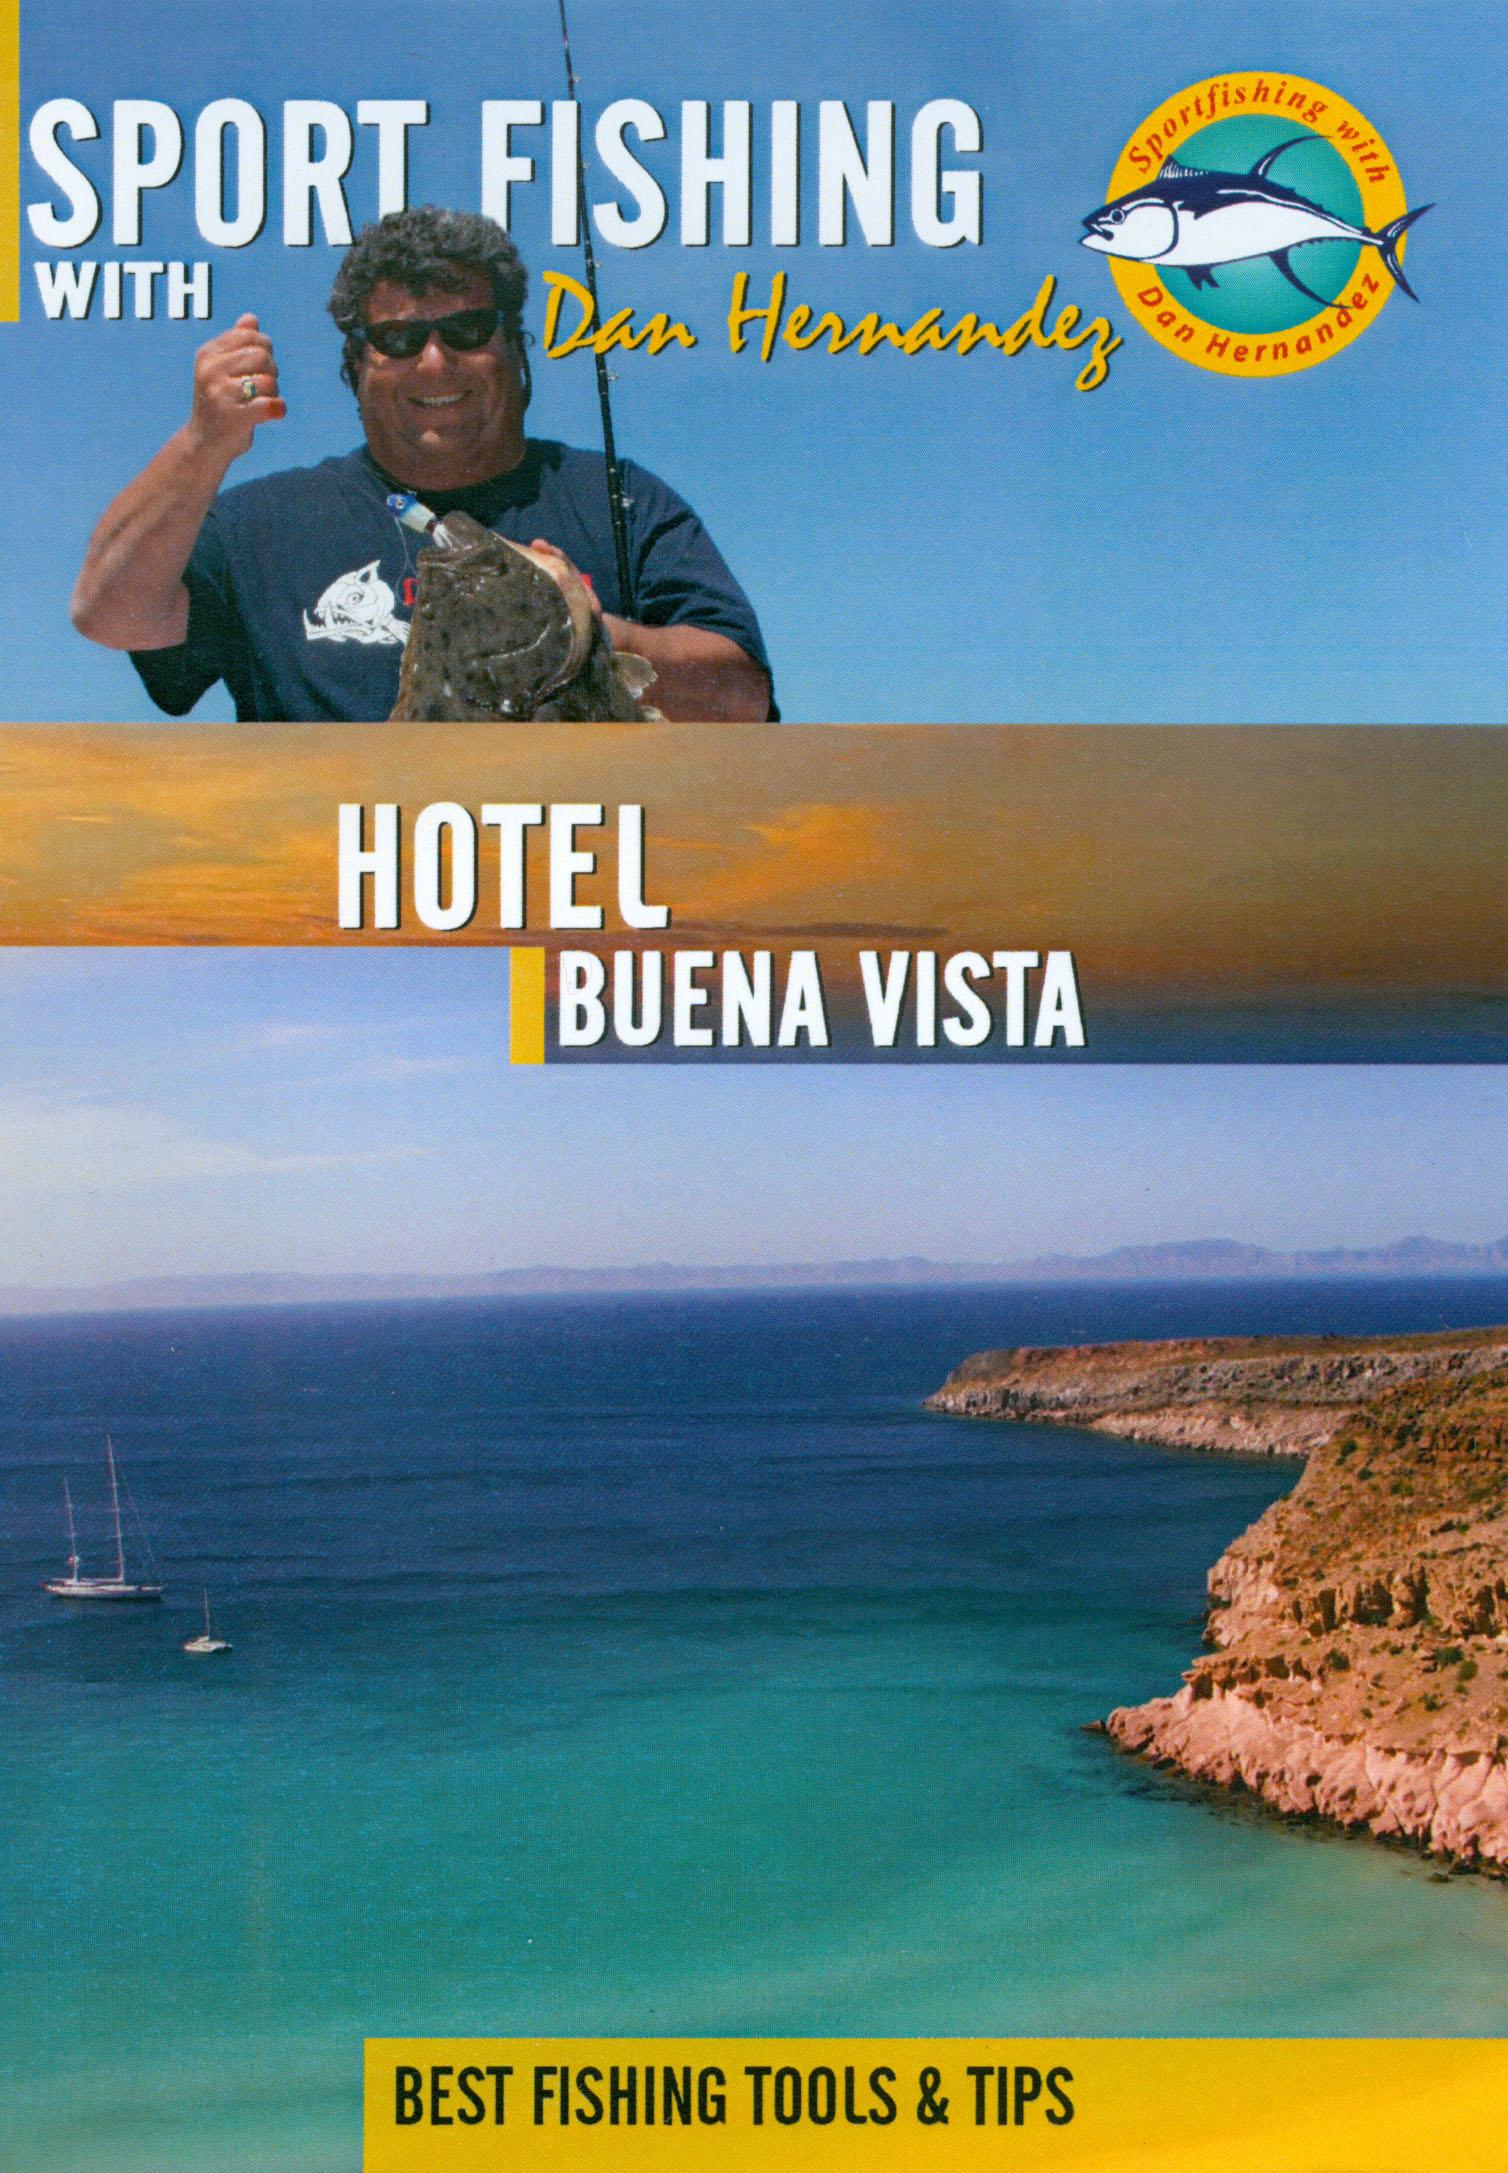 Sport Fishing With Dan Hernandez: Hotel Buena Vista East Cape, Part 2